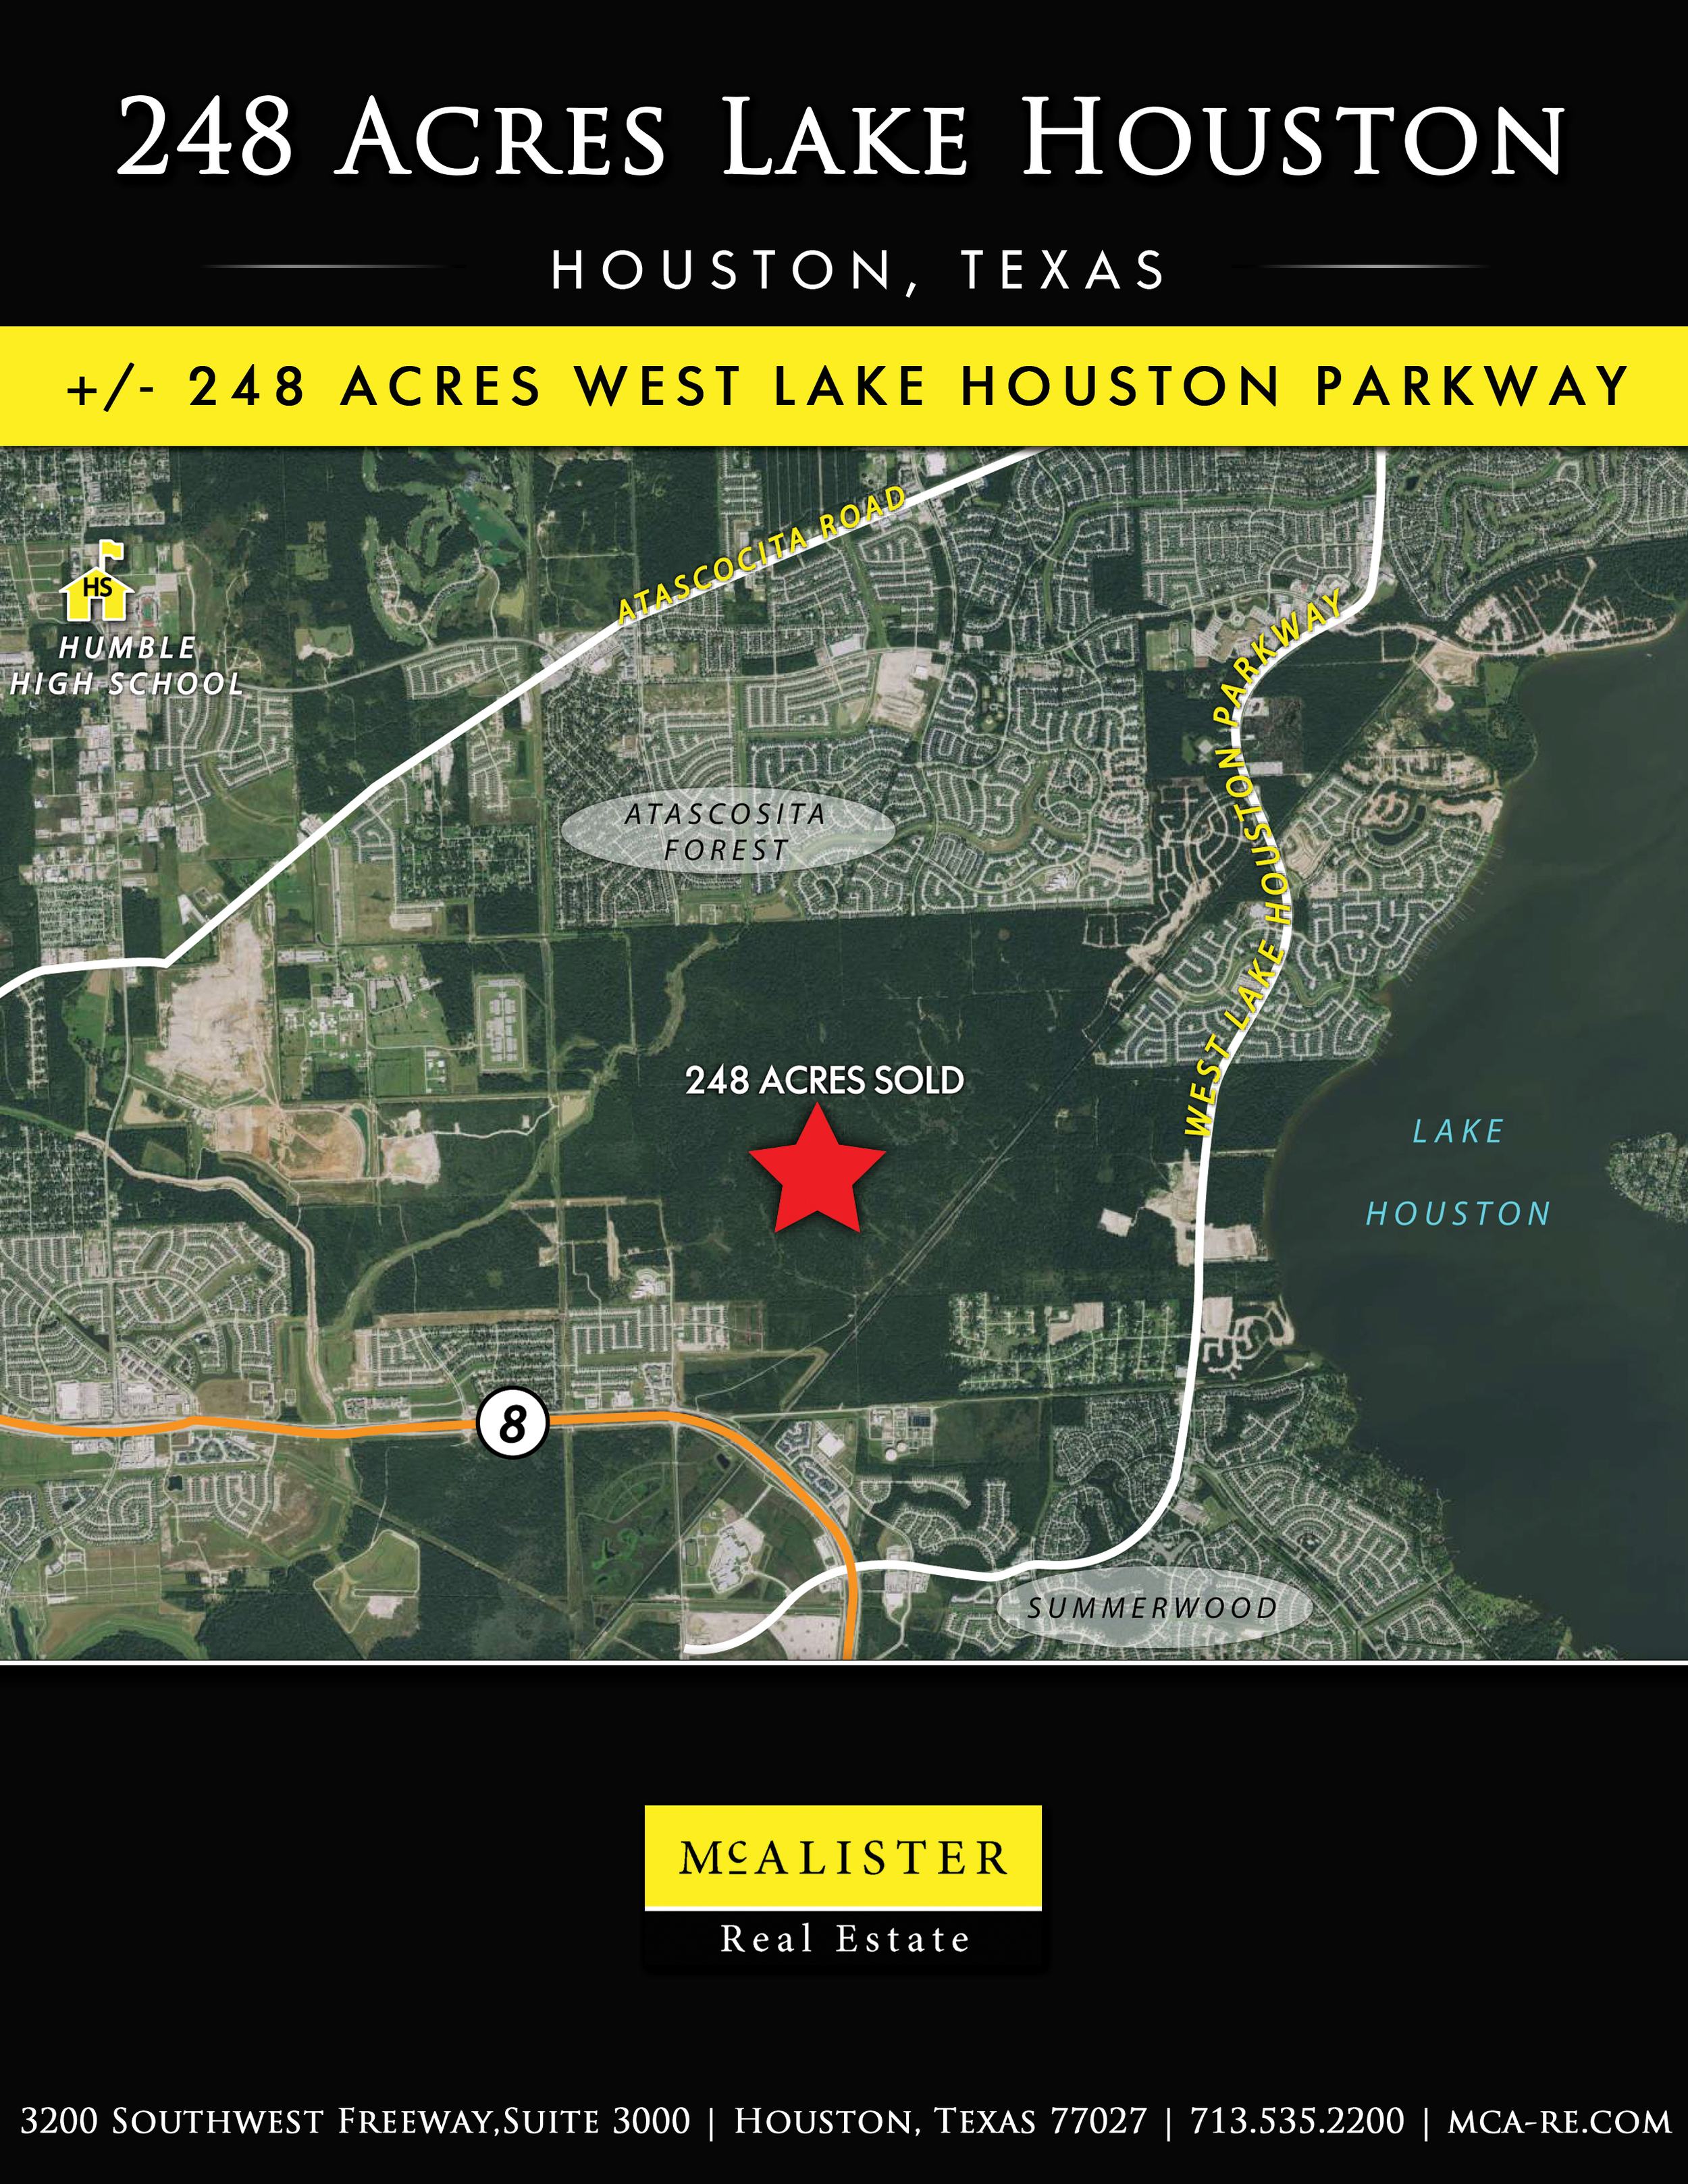 mcalister real estate west lake houston land tejas closing development